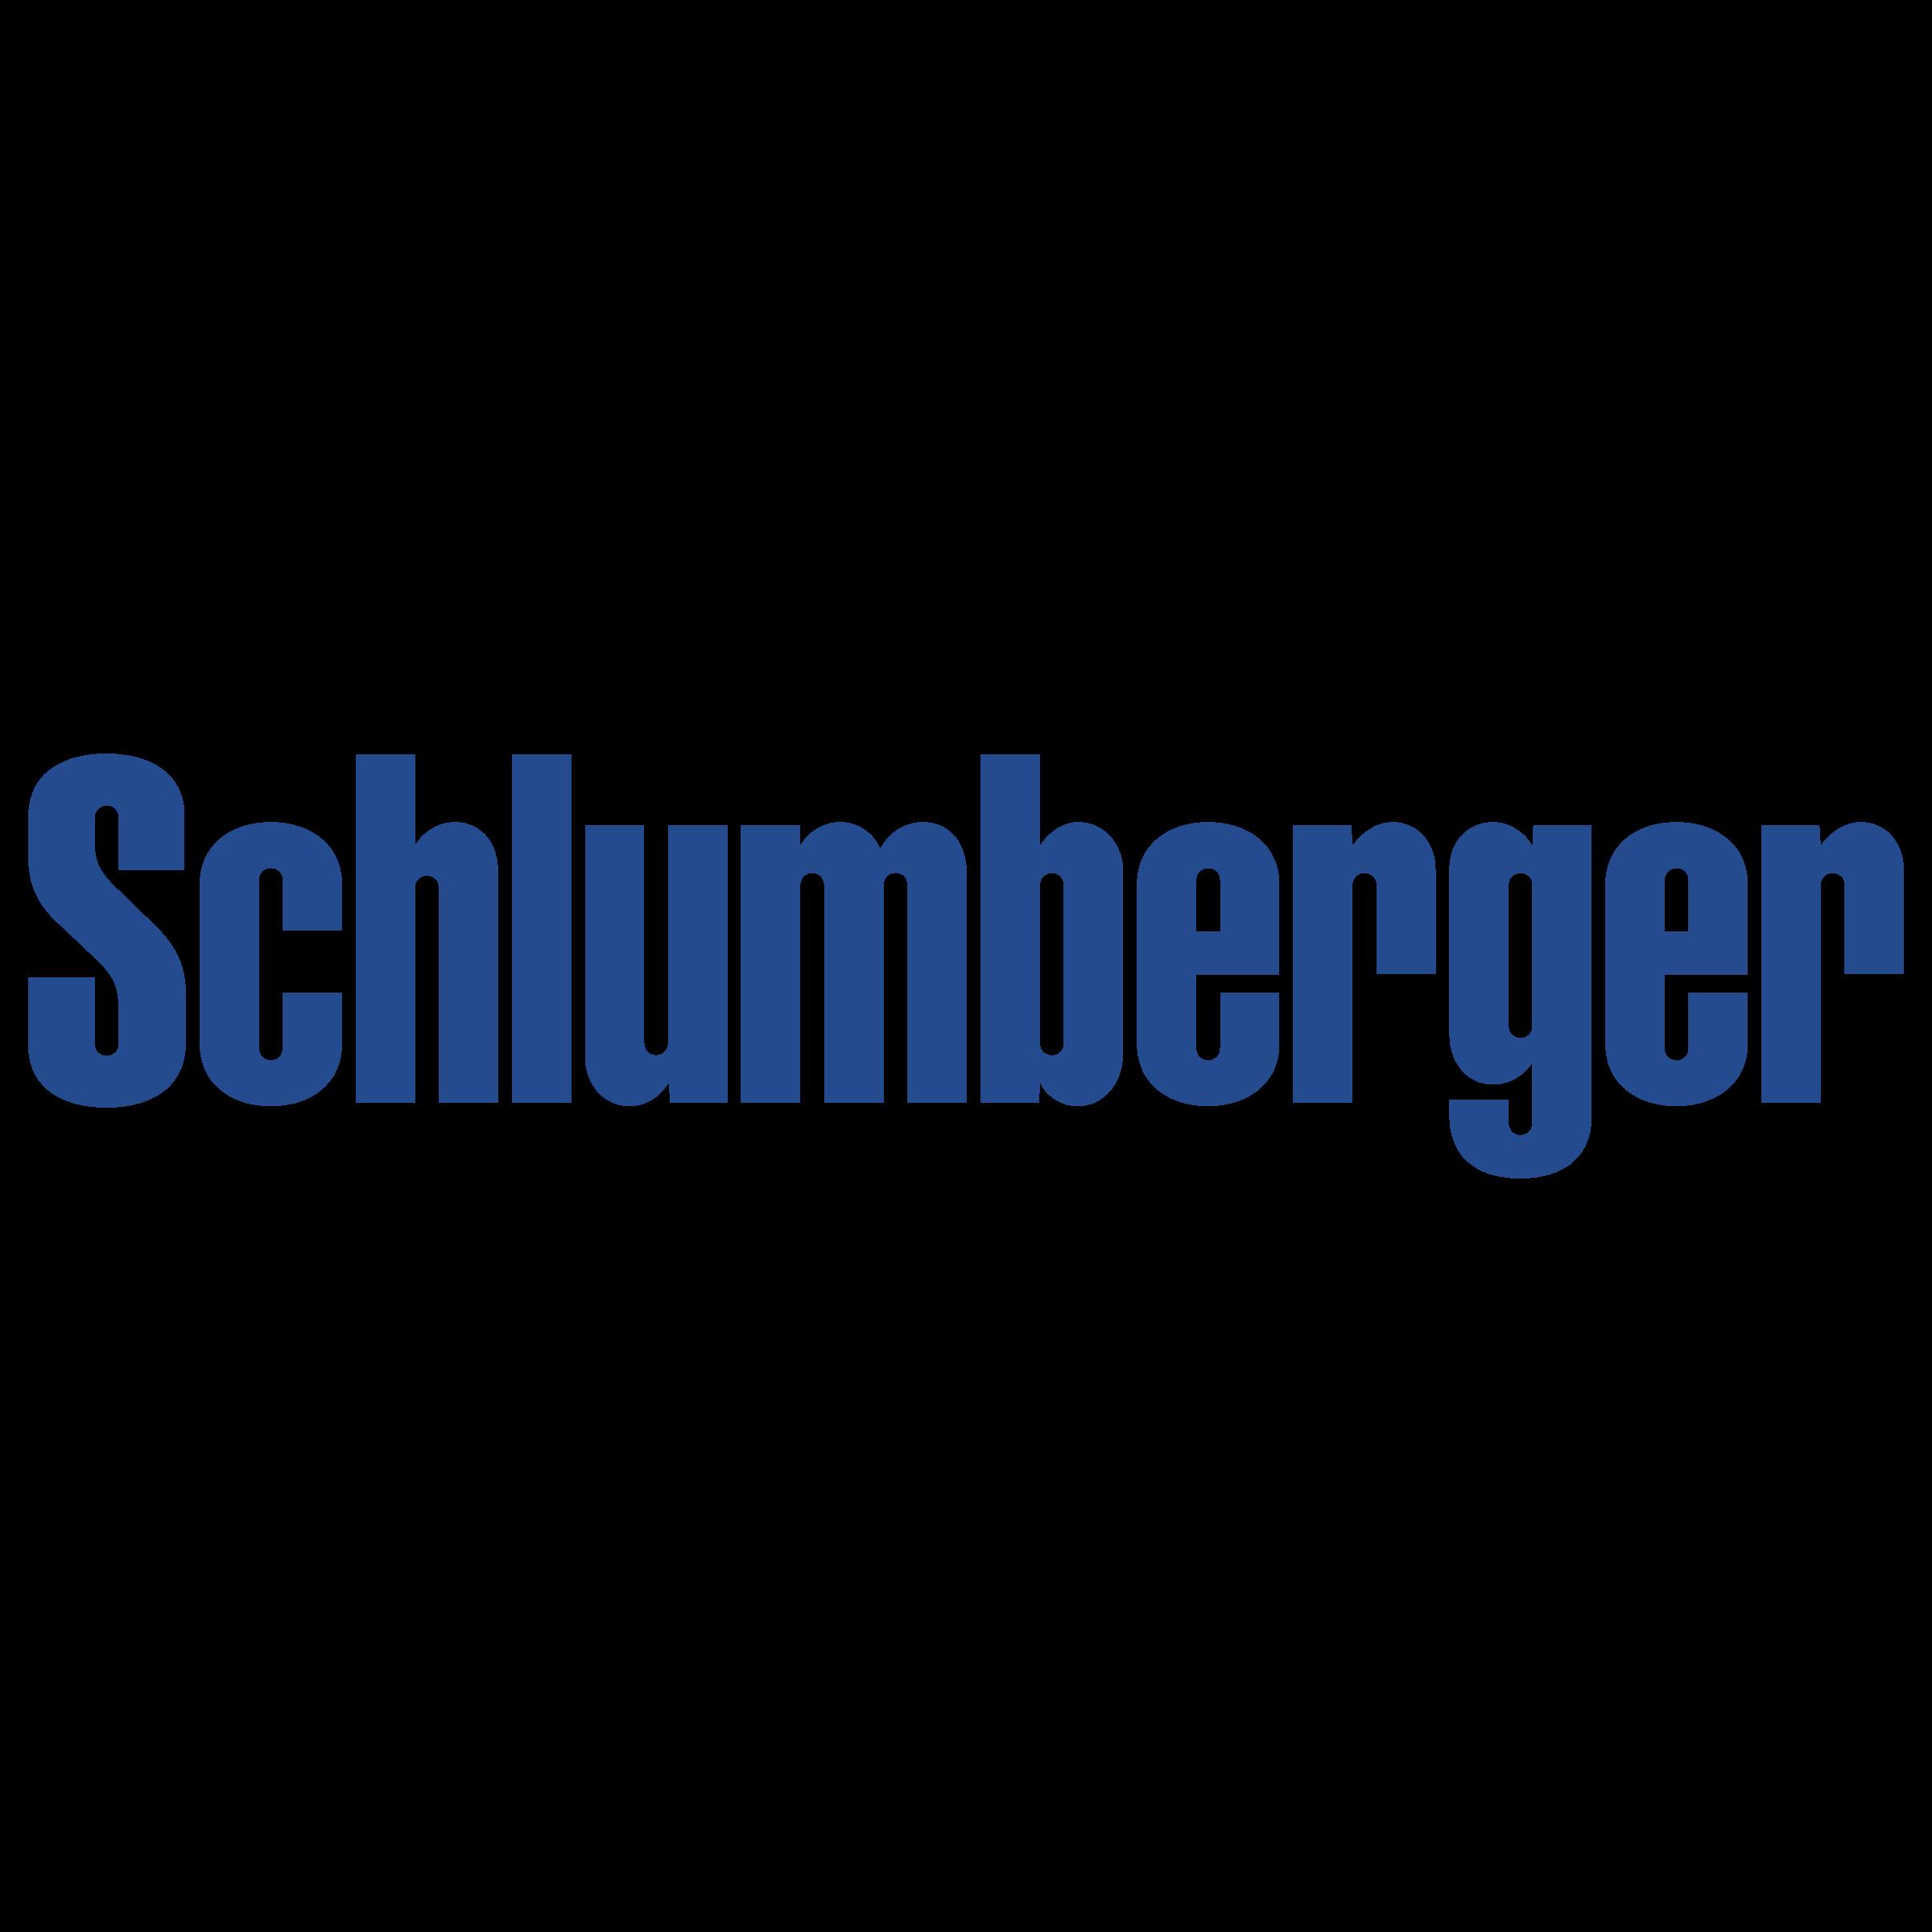 schlumberger-logo-png-transparent